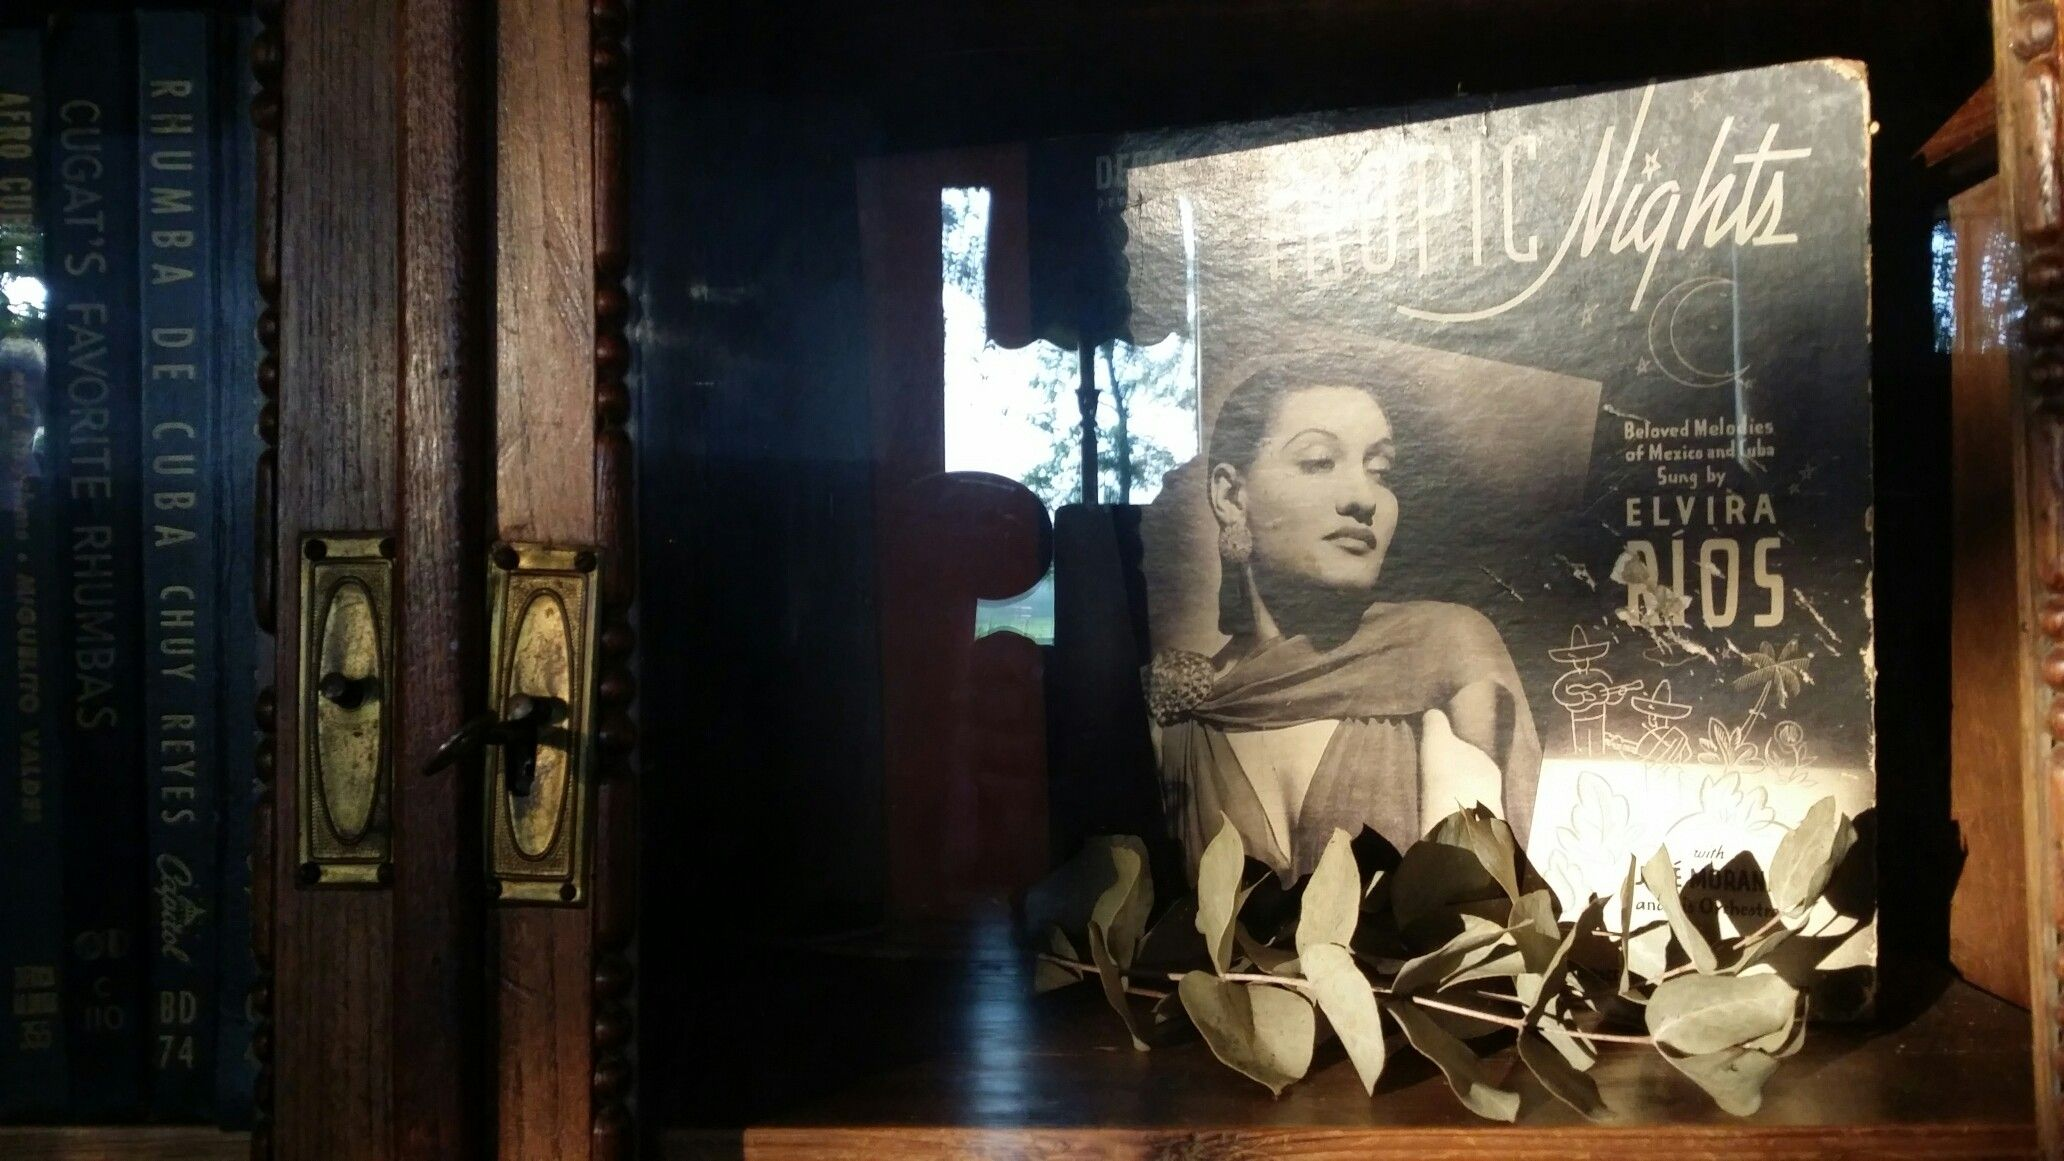 Elvira Rios - Tropic Nights #shellac